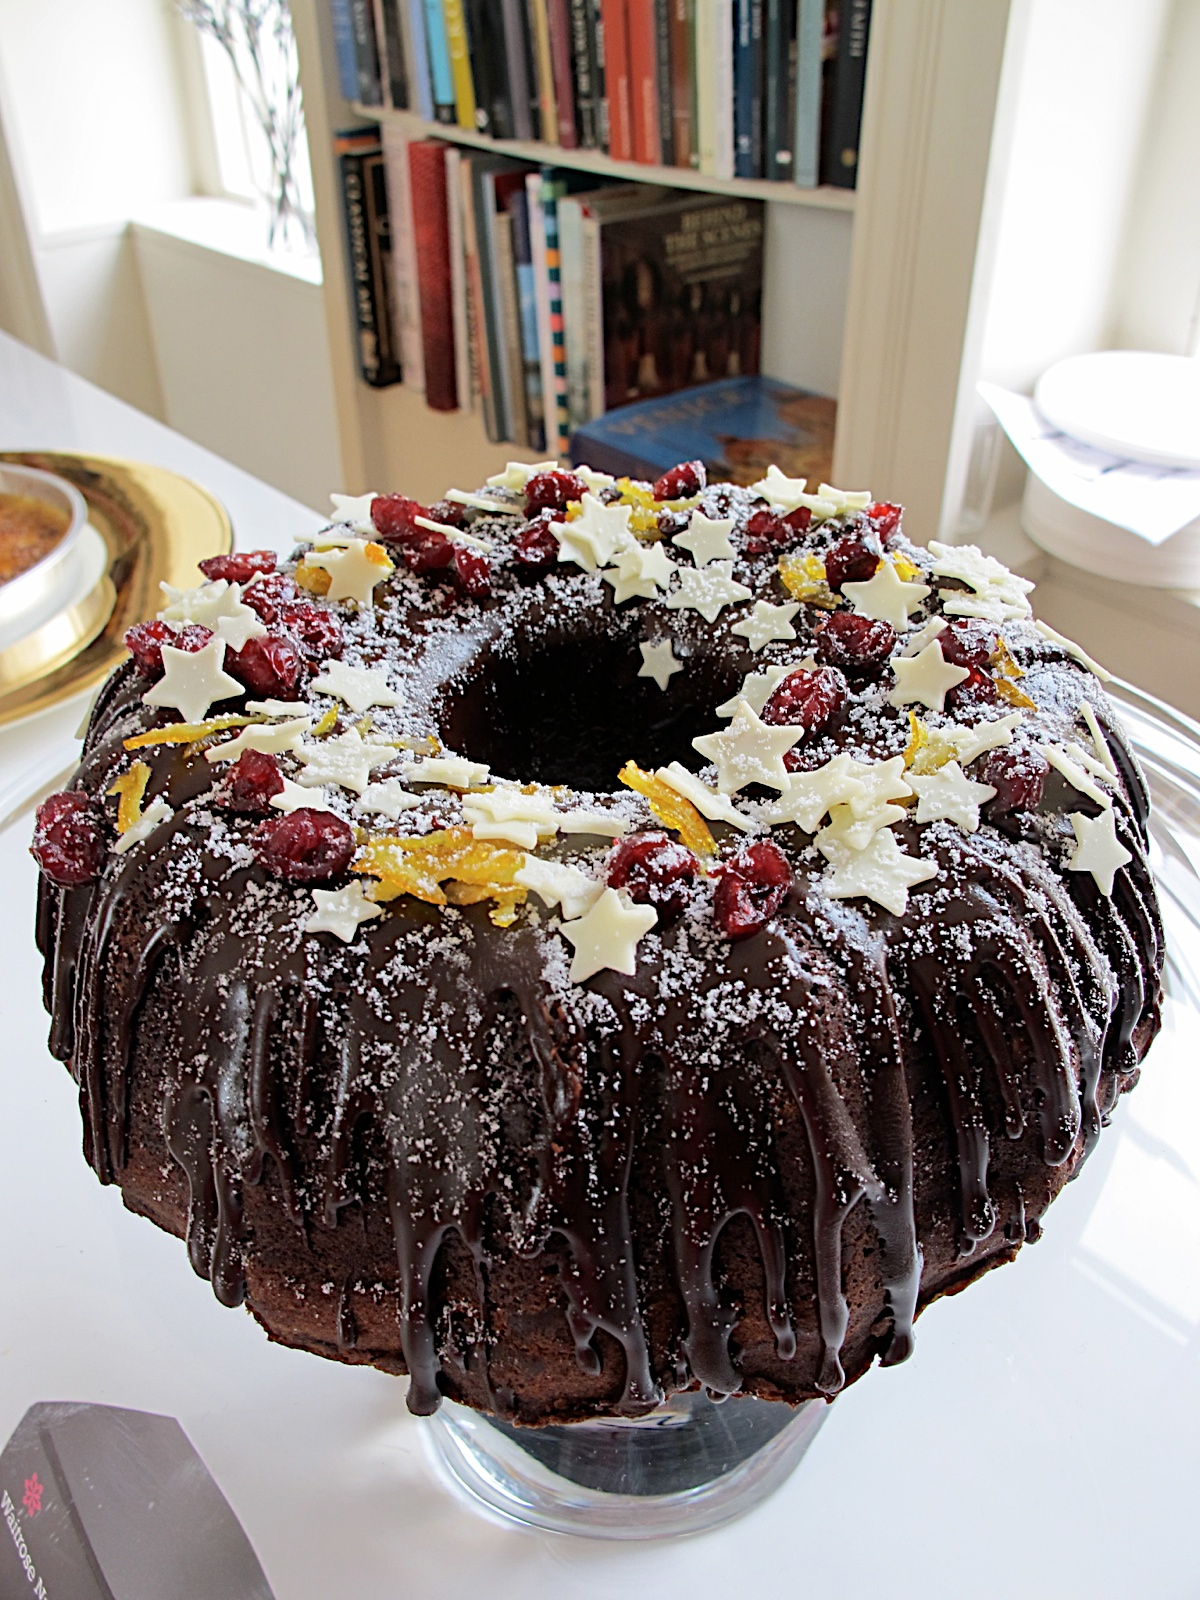 Christmas Cake Decorating Ideas Waitrose : Waitrose Christmas food range: top treats to try